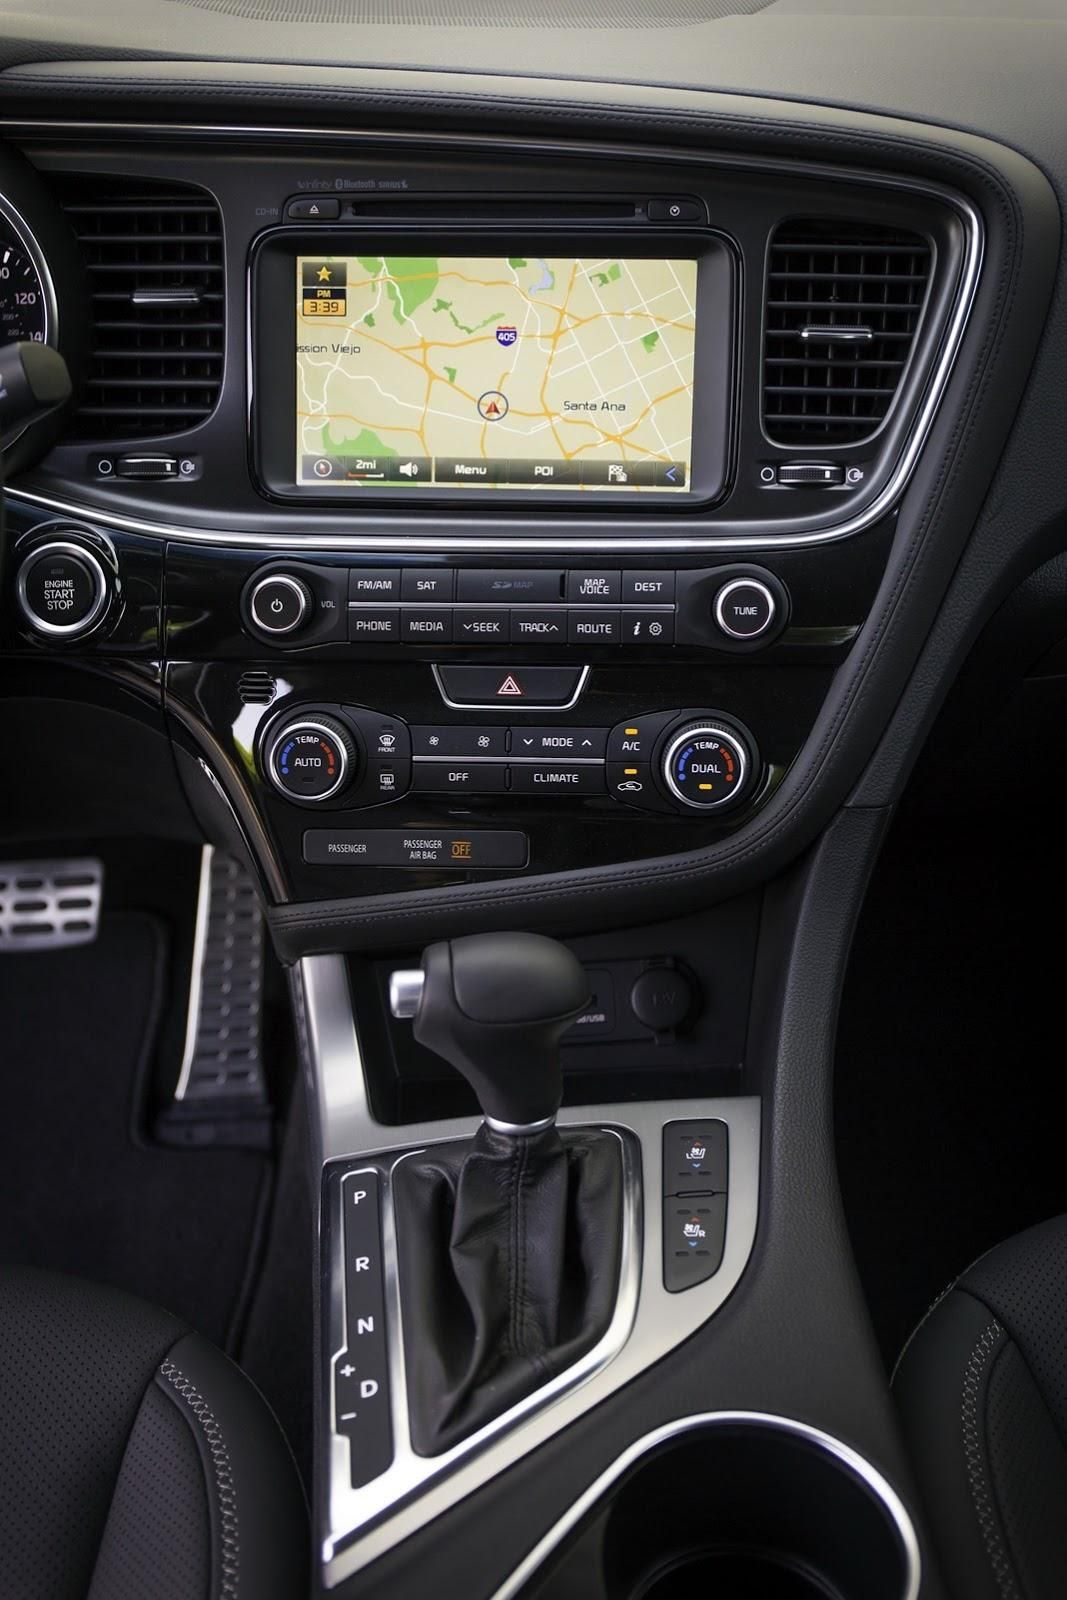 Review 2016 kia optima lx t car reviews car reviews pinterest 2016 kia optima lx kia optima and cars